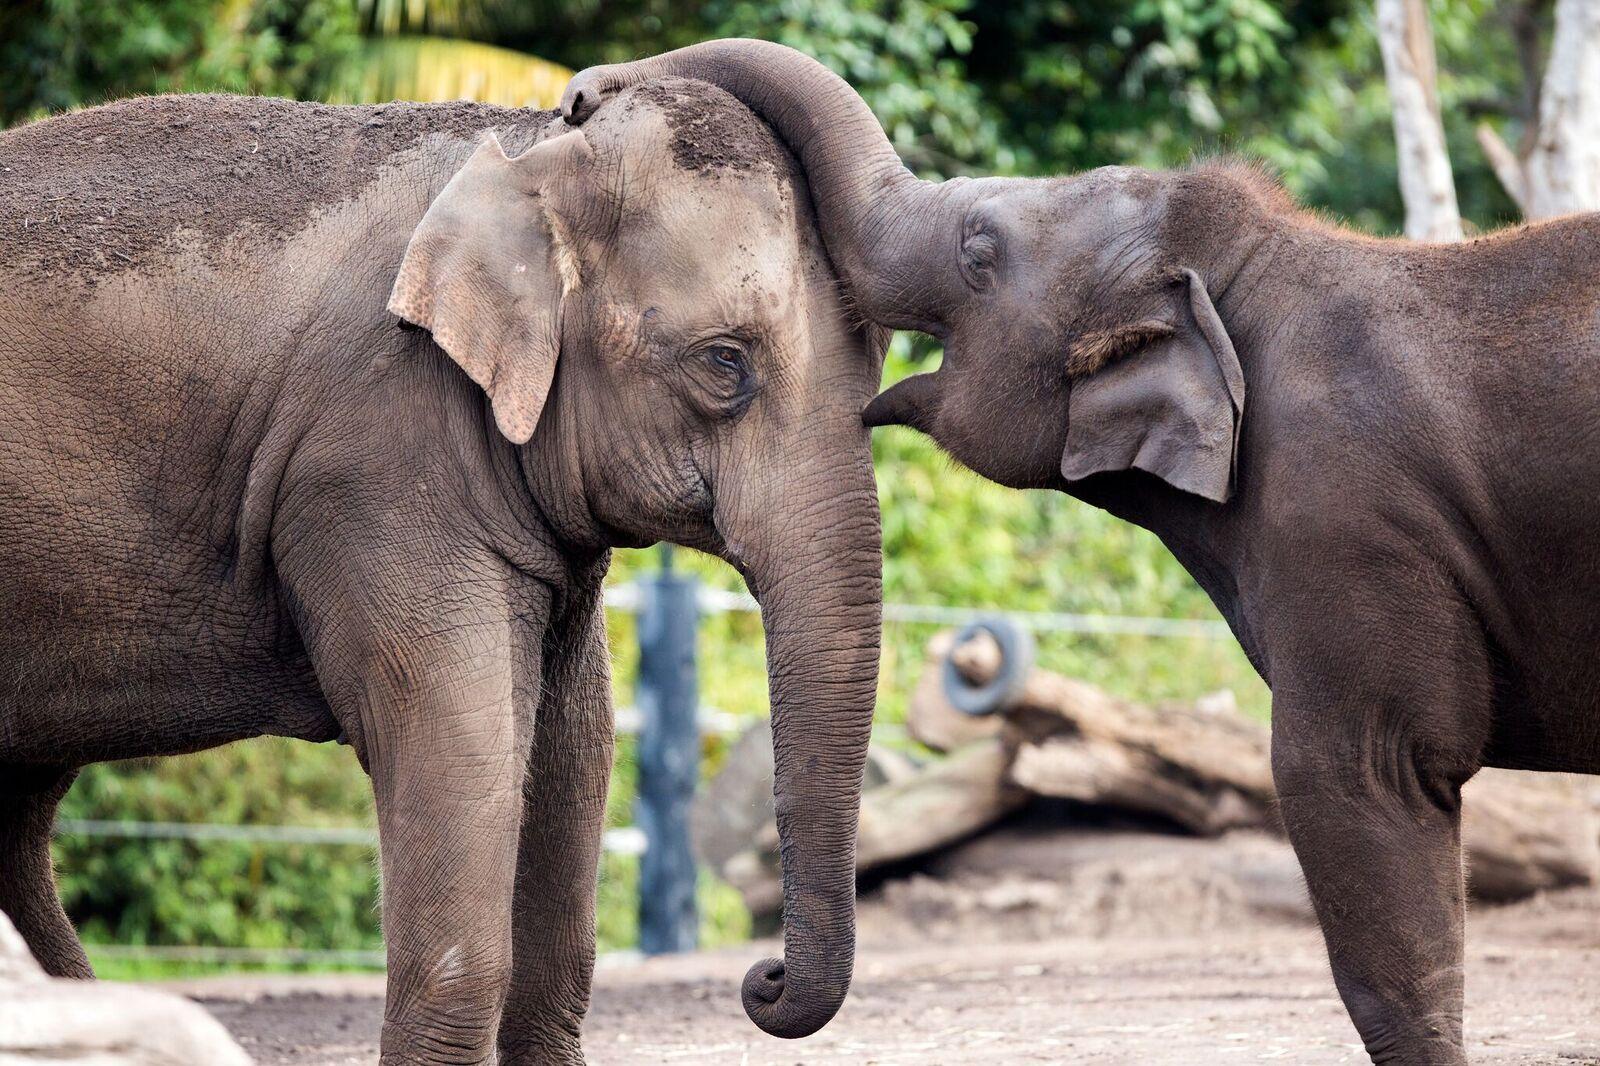 Taronga Zoo Annual Pass GIVEAWAY!